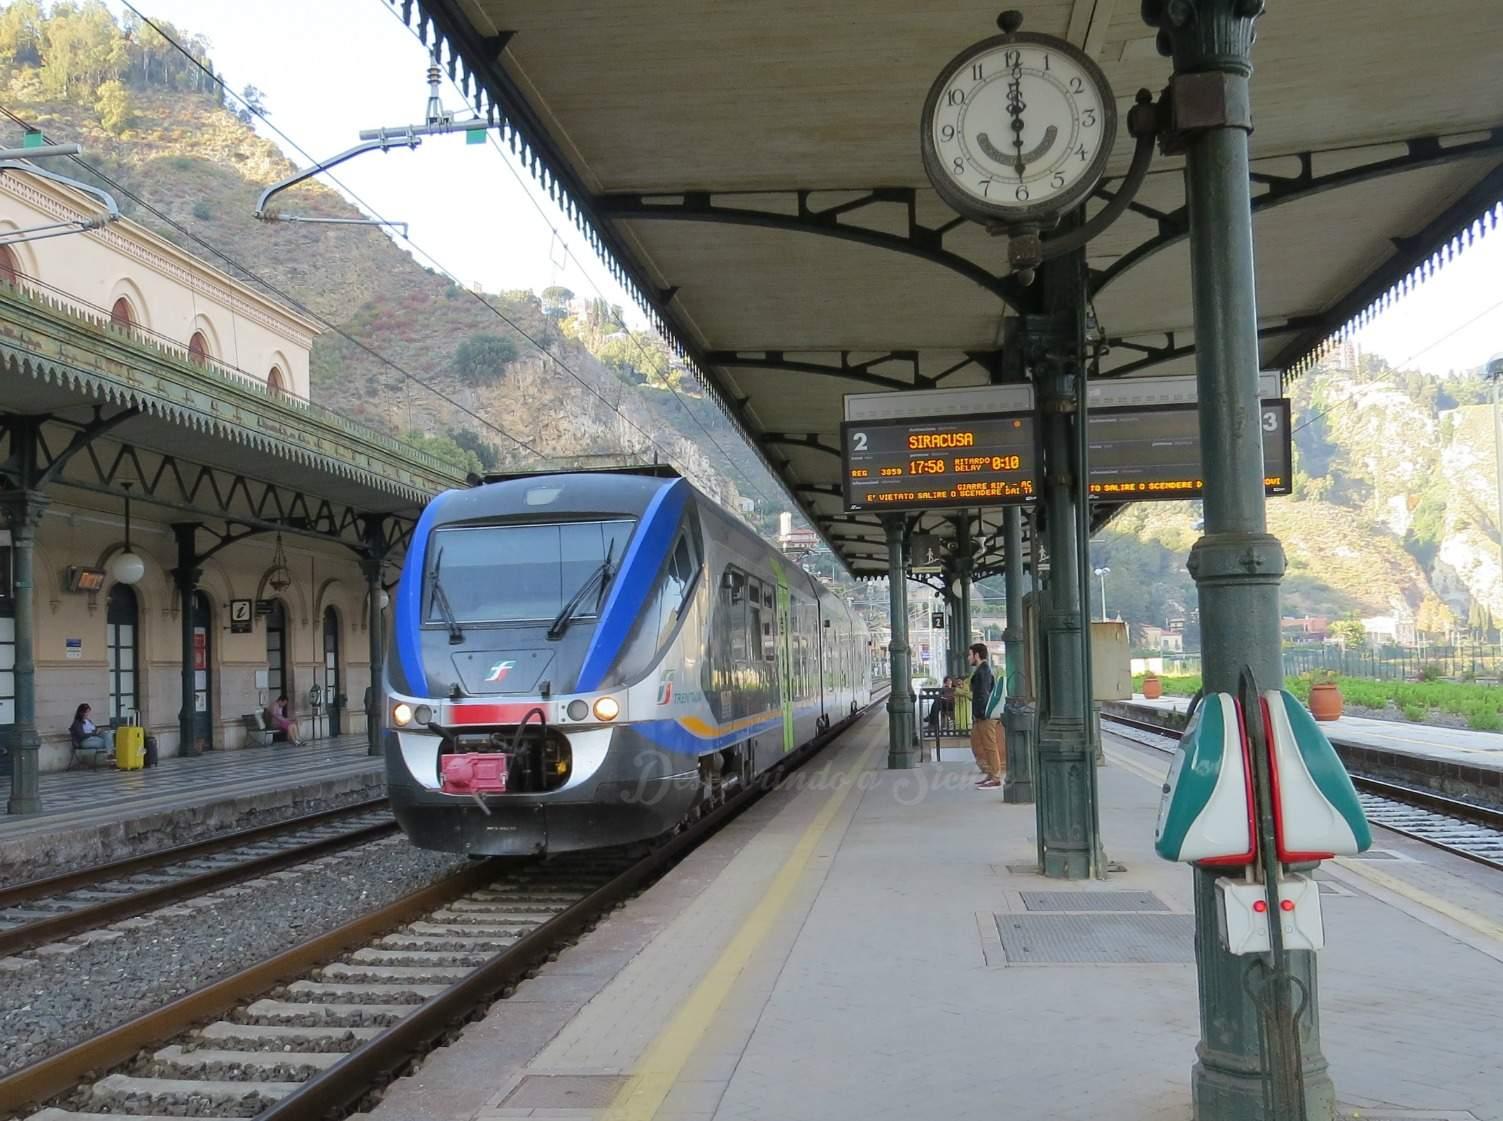 Trens na Sicília